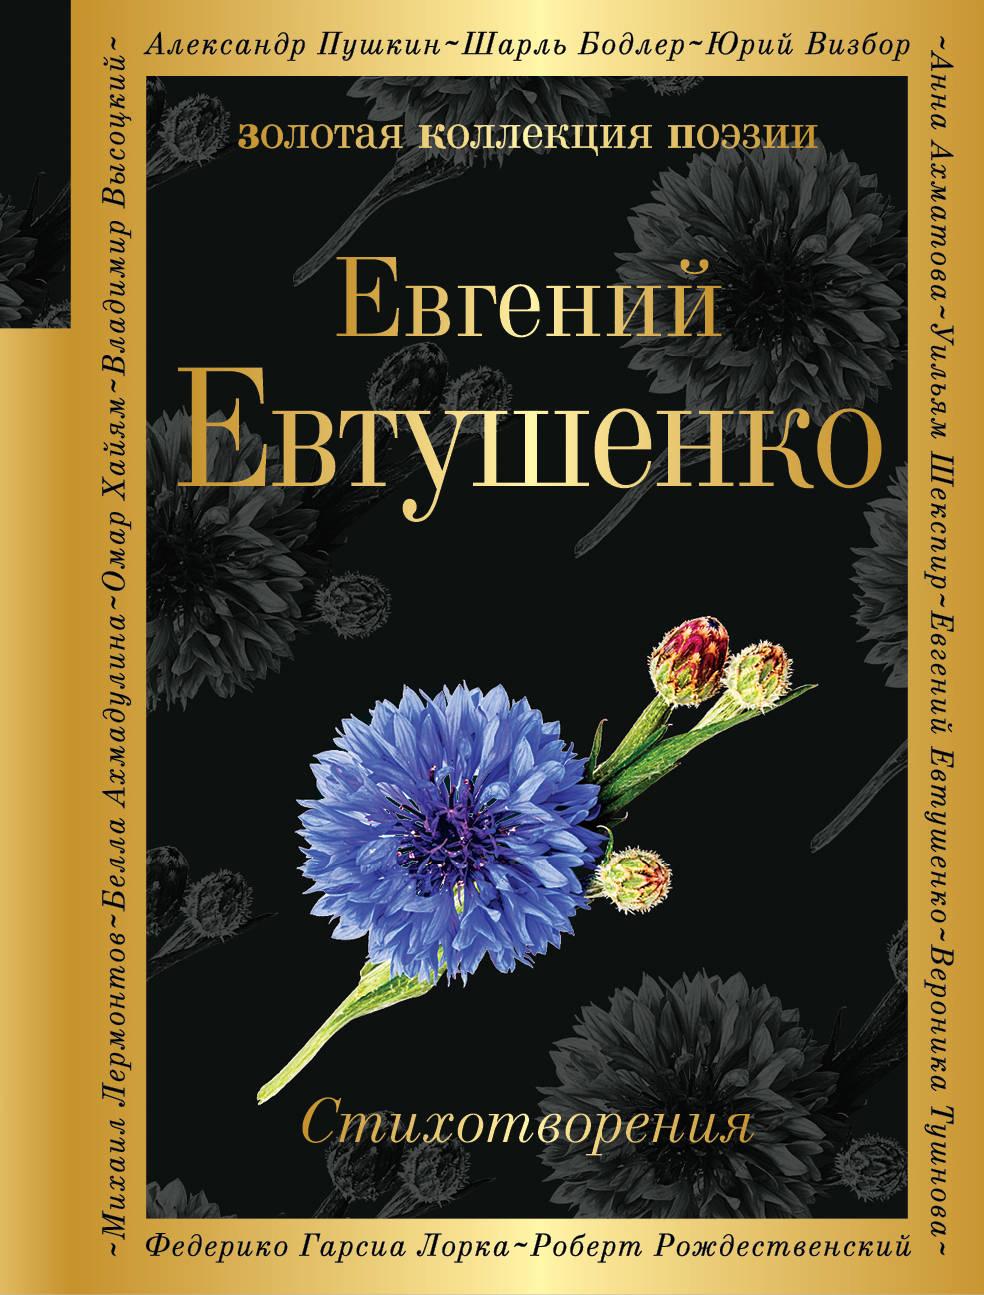 Евгений Евтушенко Евгений Евтушенко. Стихотворения евтушенко е со мною вот что происходит…